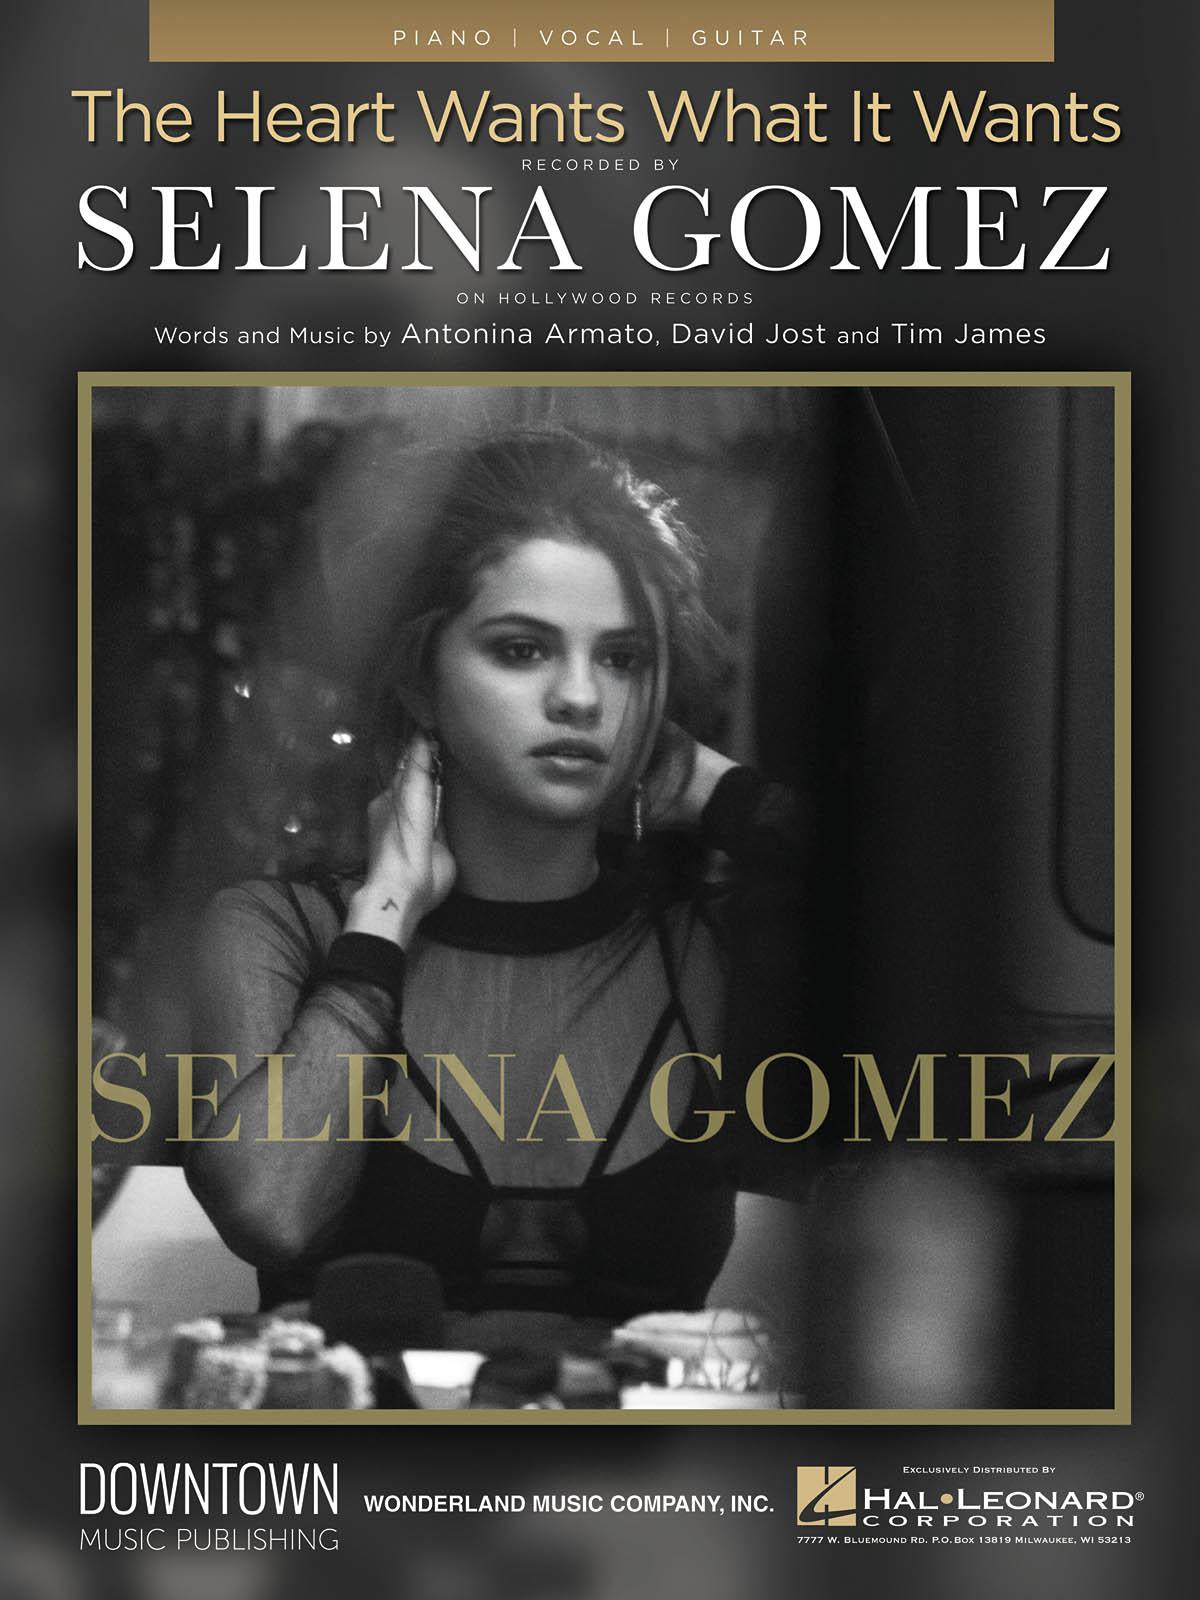 Selena Gomez: The Heart Wants What It Wants: Piano  Vocal  Guitar: Single Sheet